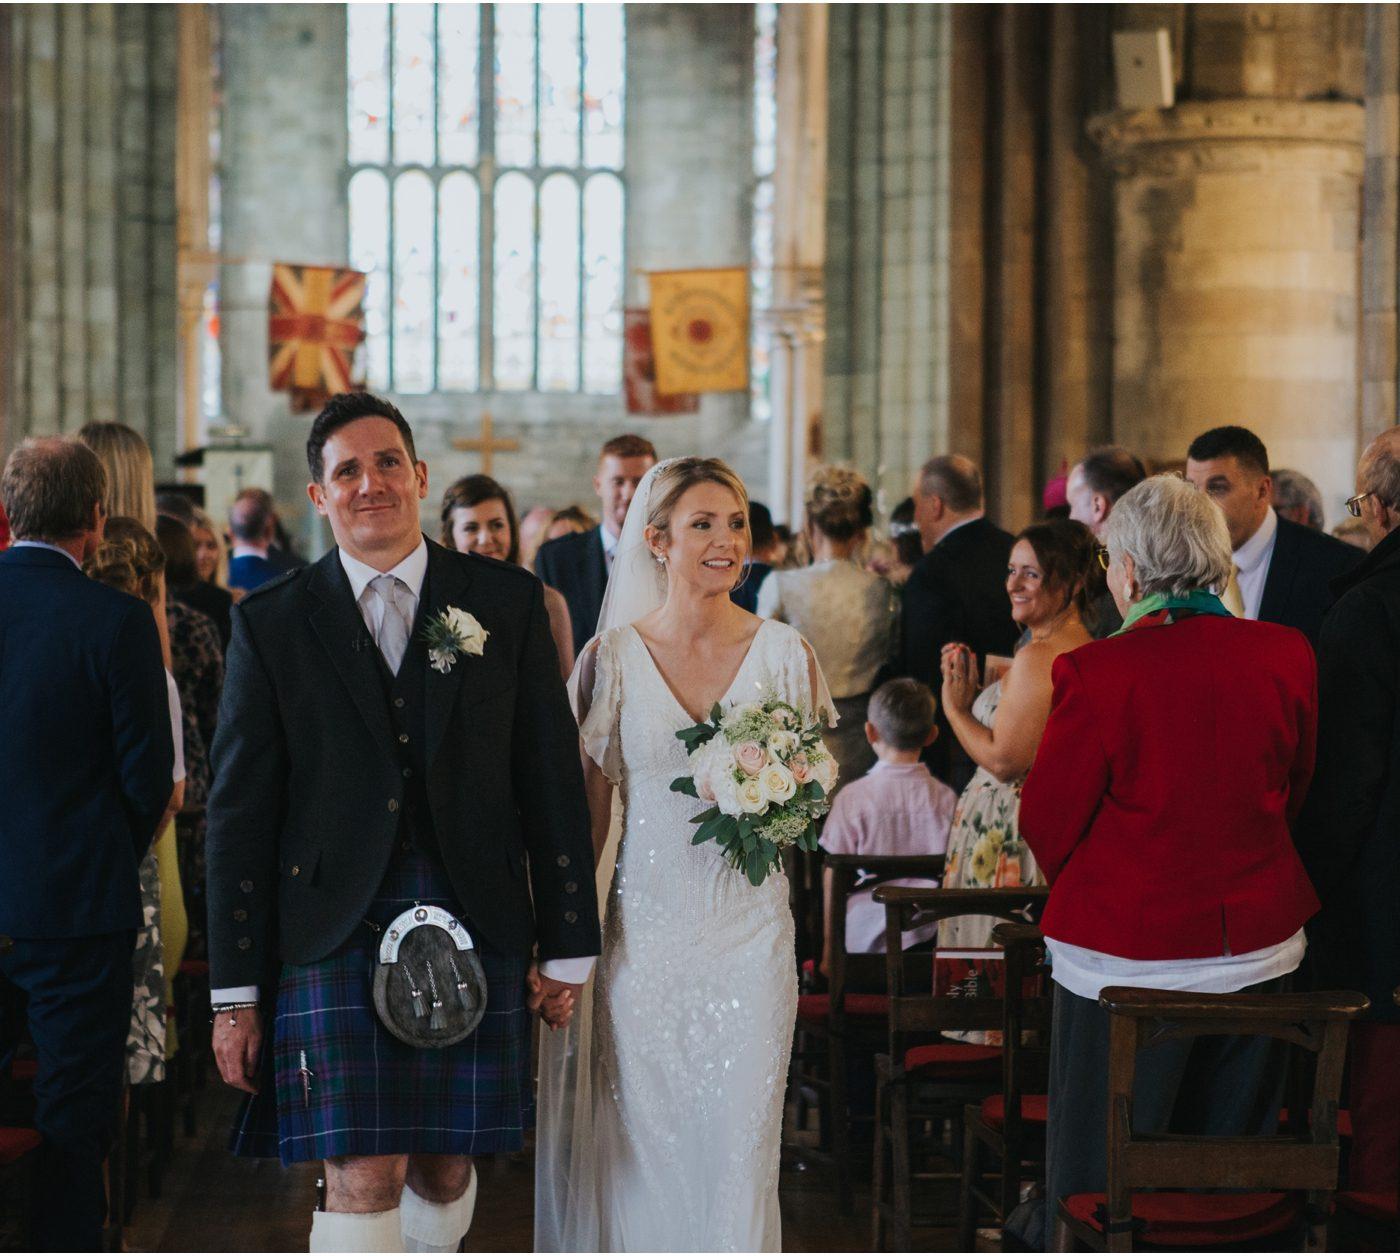 Elegant Stirling wedding at Church of the Holy Rude & Cowanes Hospital - Pamela & Johnnie